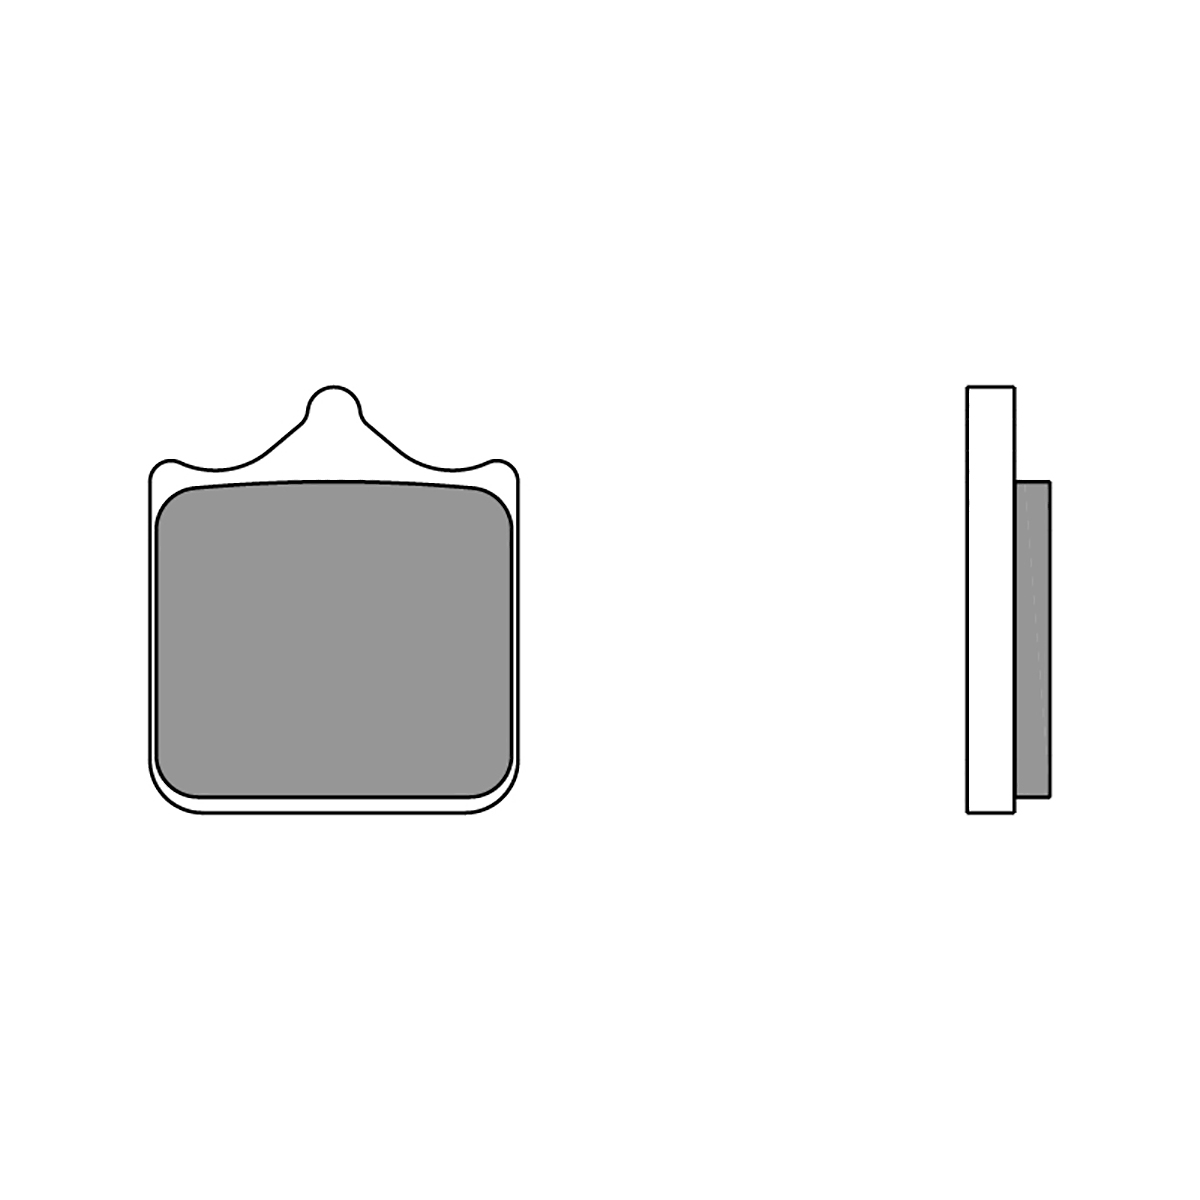 07BB33SC Pastillas Brembo Freno Delantero 07BB33SC para Ktm SMC R ABS 690 2014 > 2020